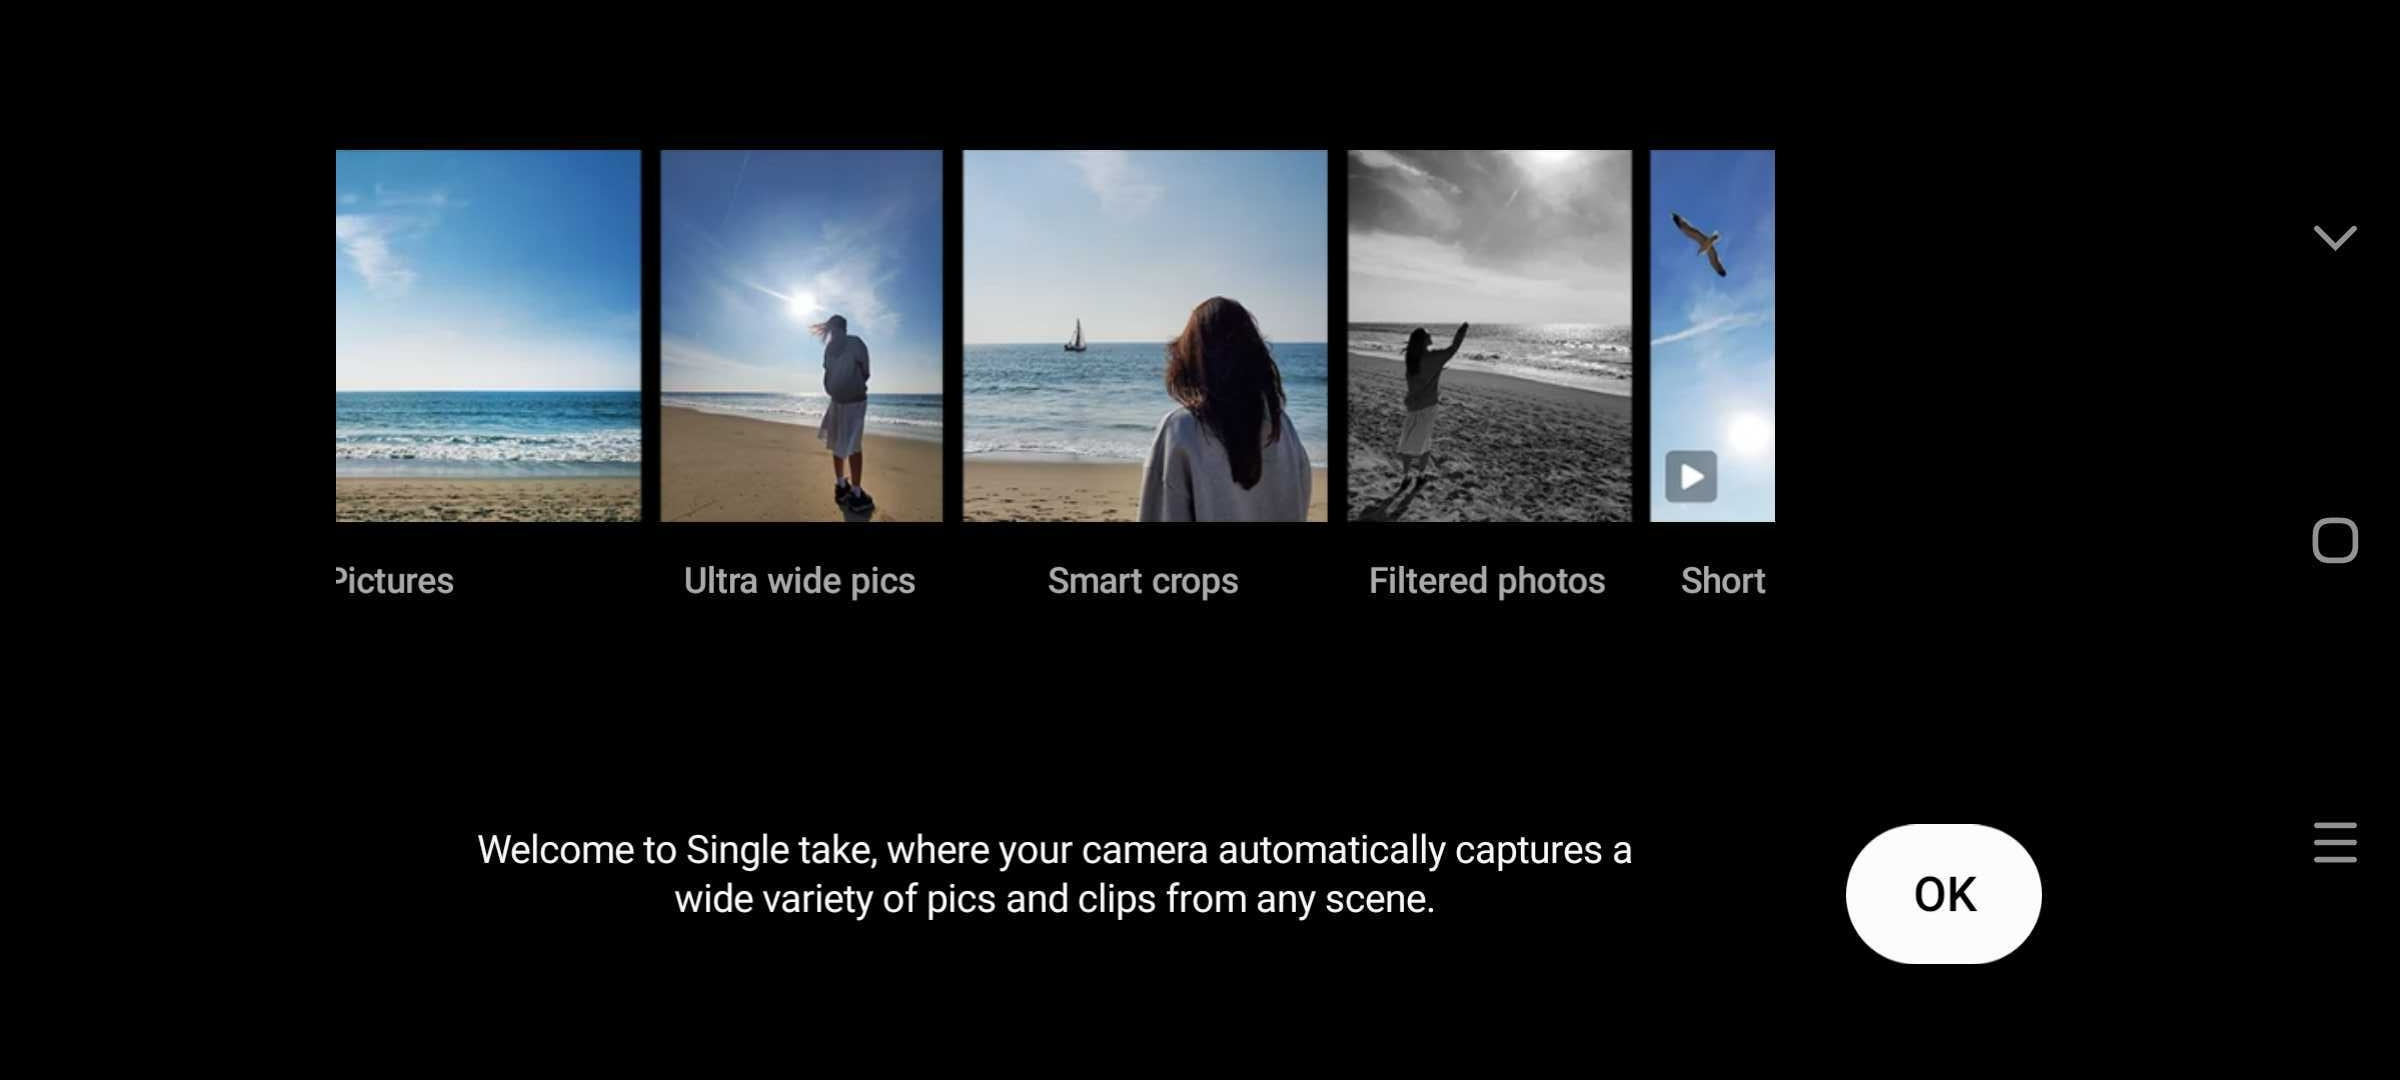 galaxy s20 single take camera mode